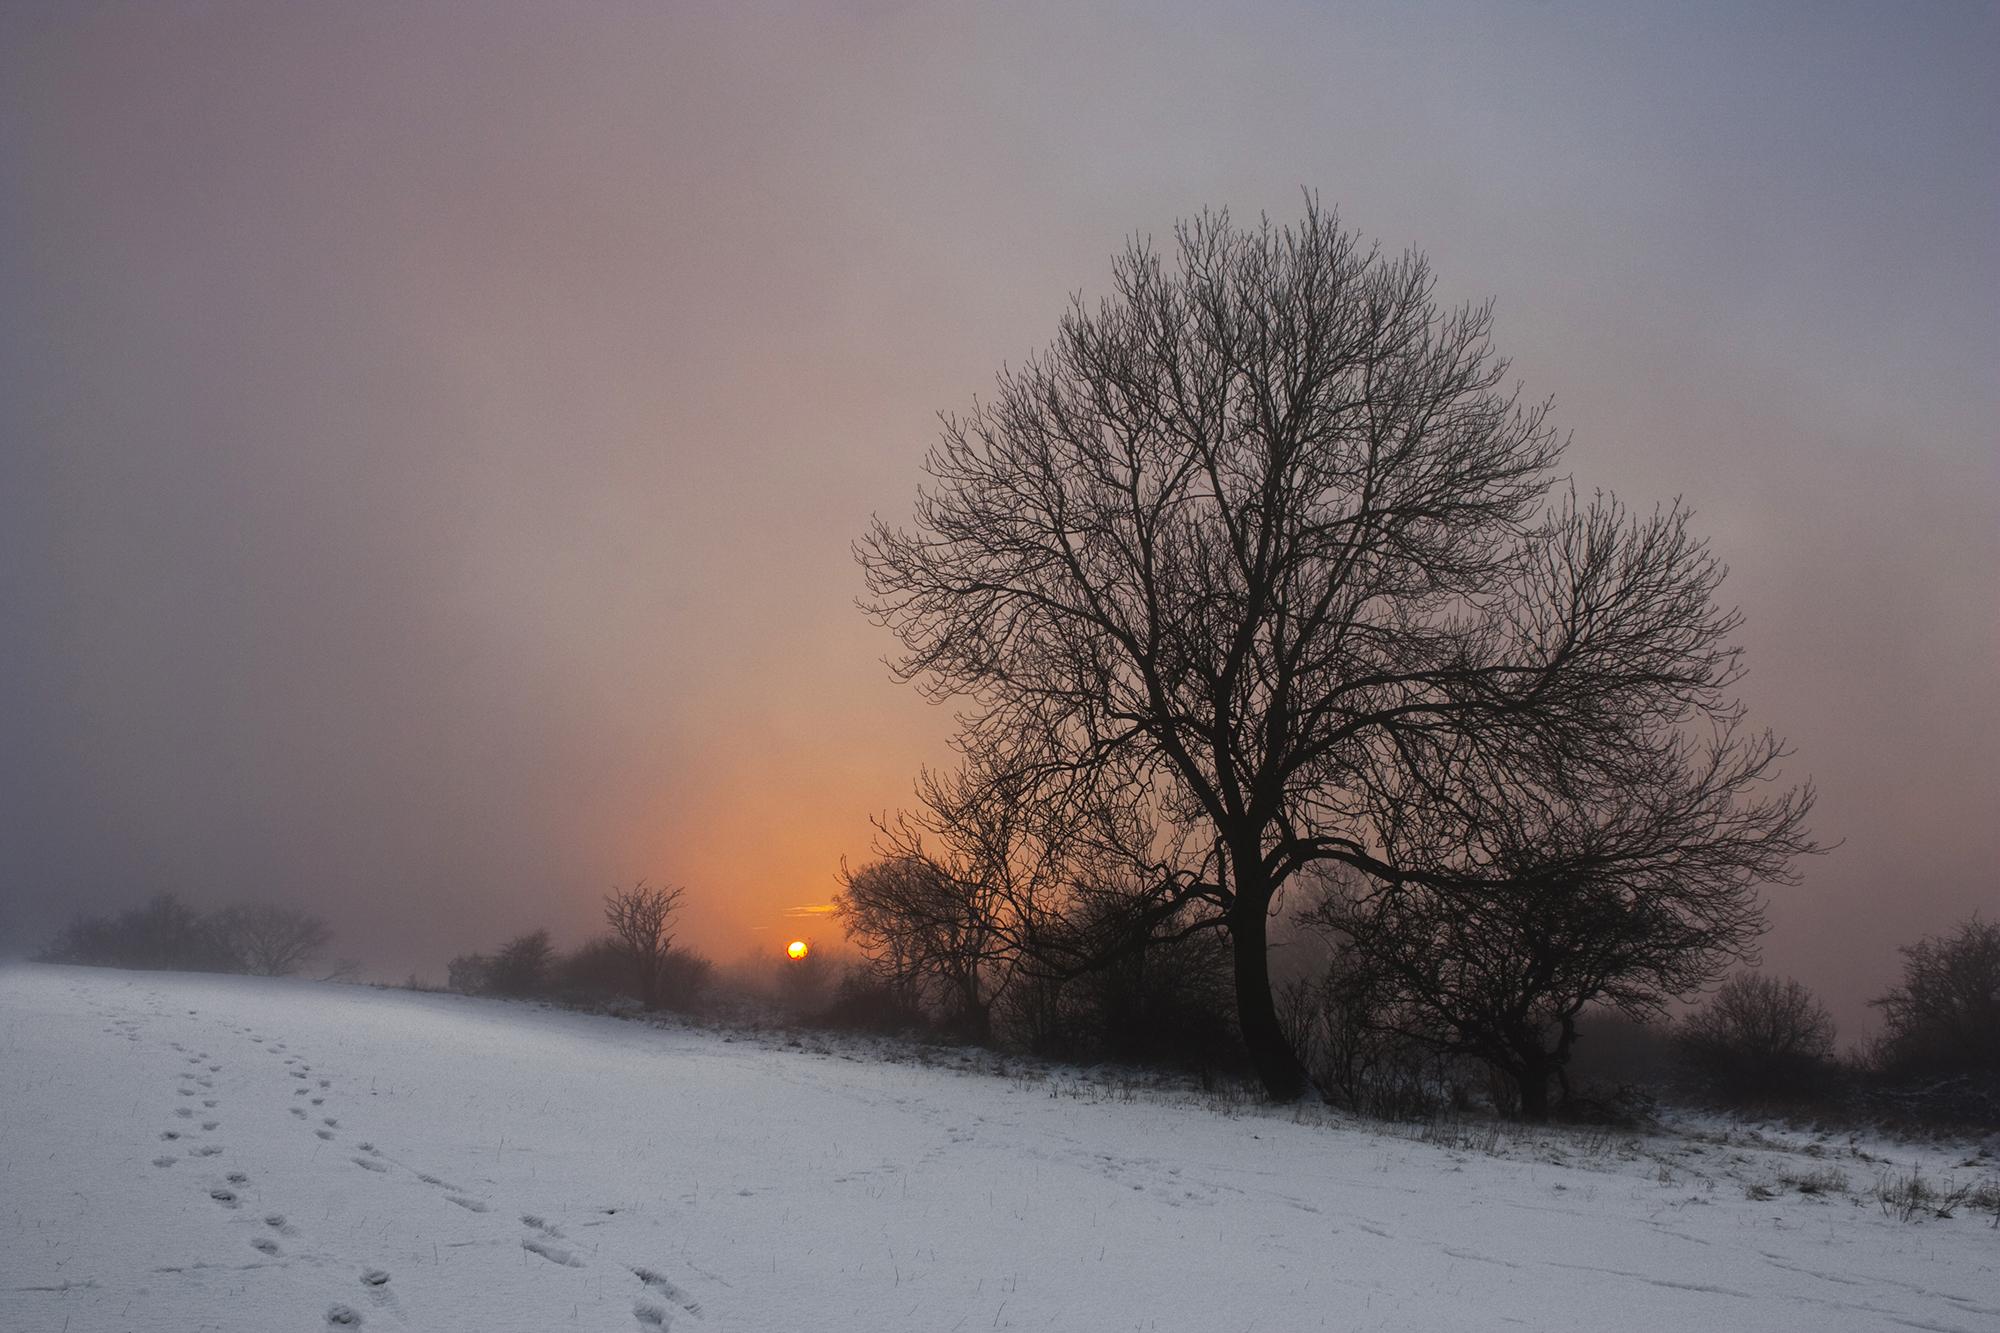 downs winter_2.jpg